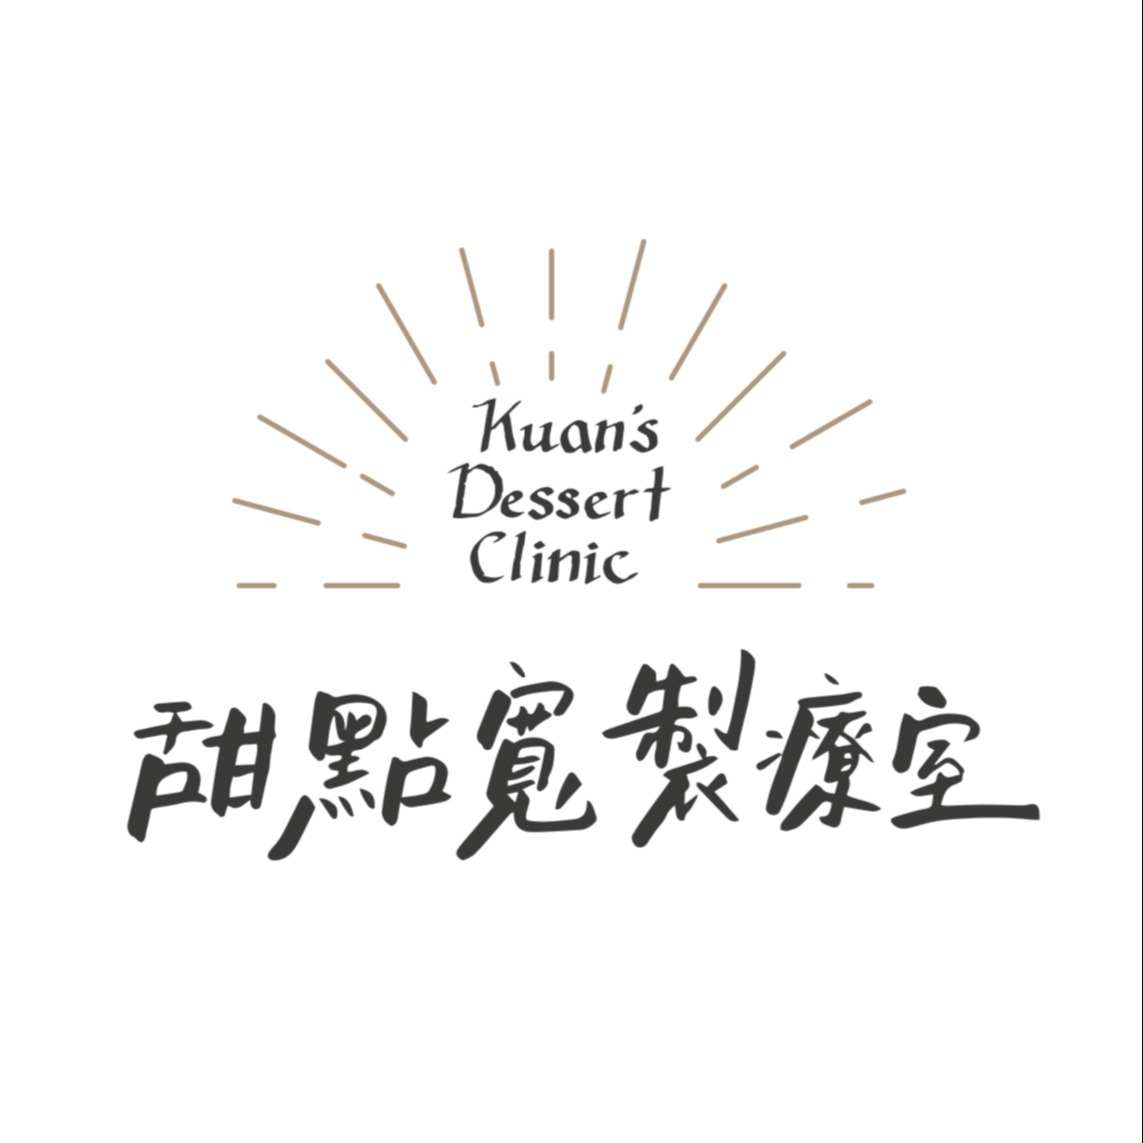 @kuansdessertclinic Profile Image | Linktree